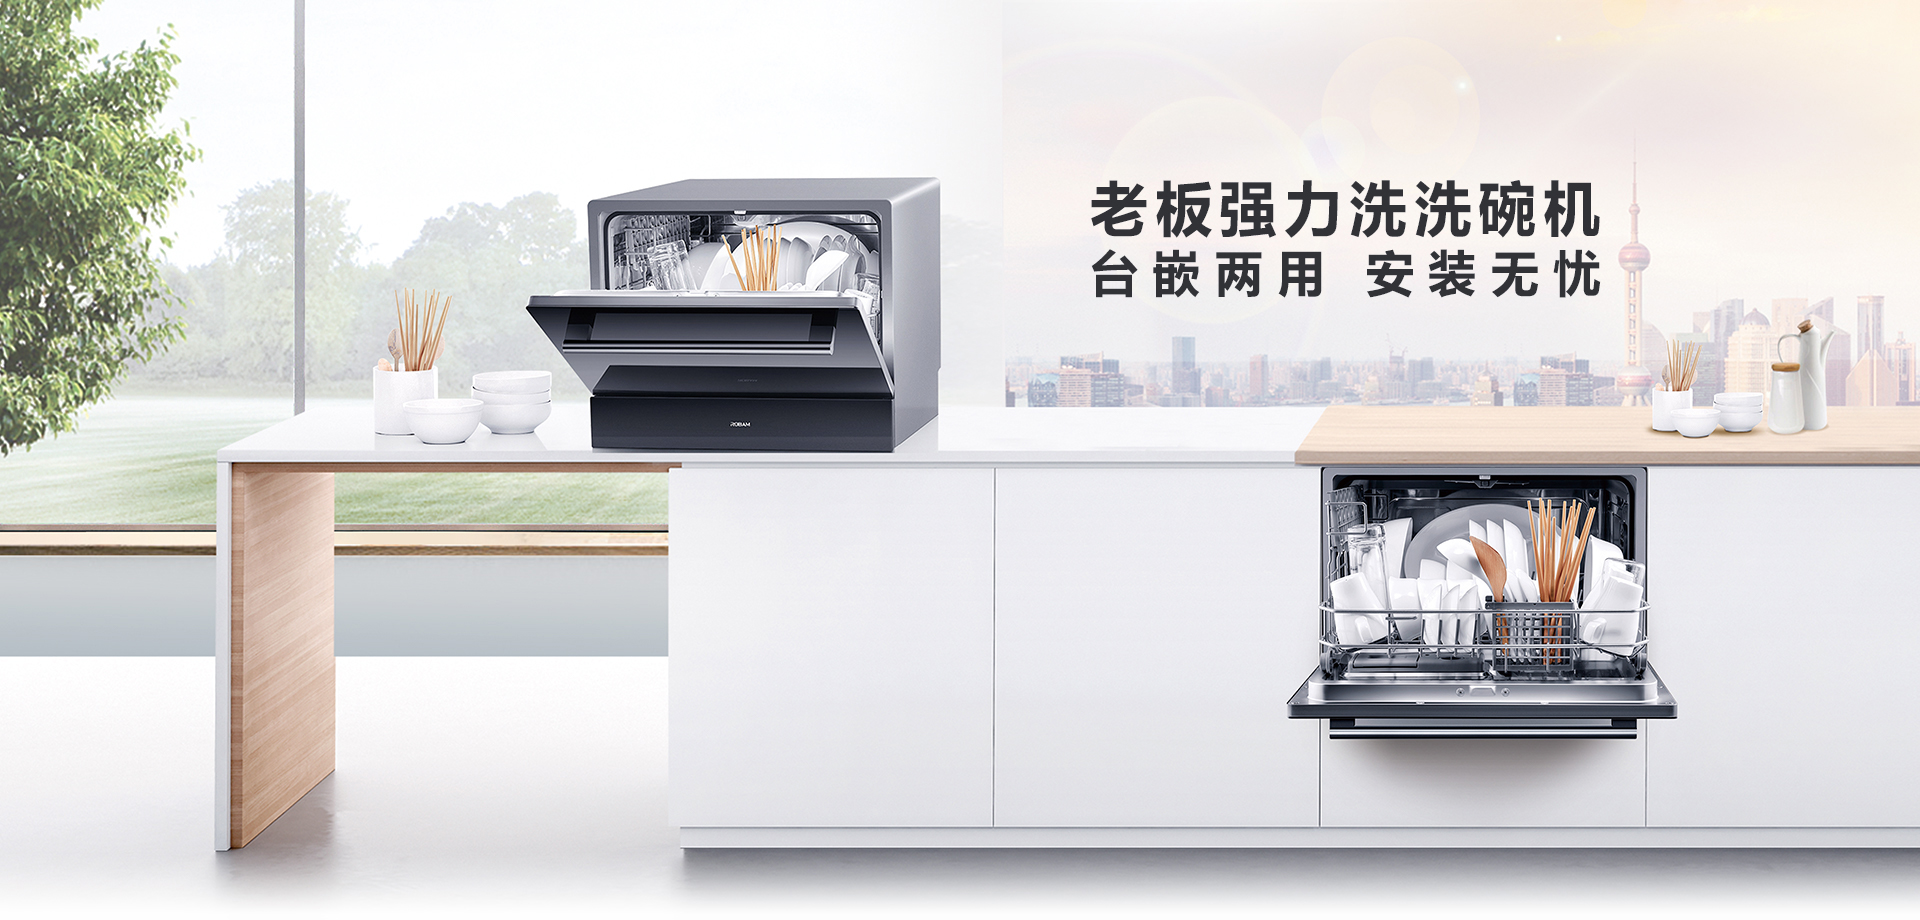 W703-洗碗机上新-190513-网页版_01.jpg